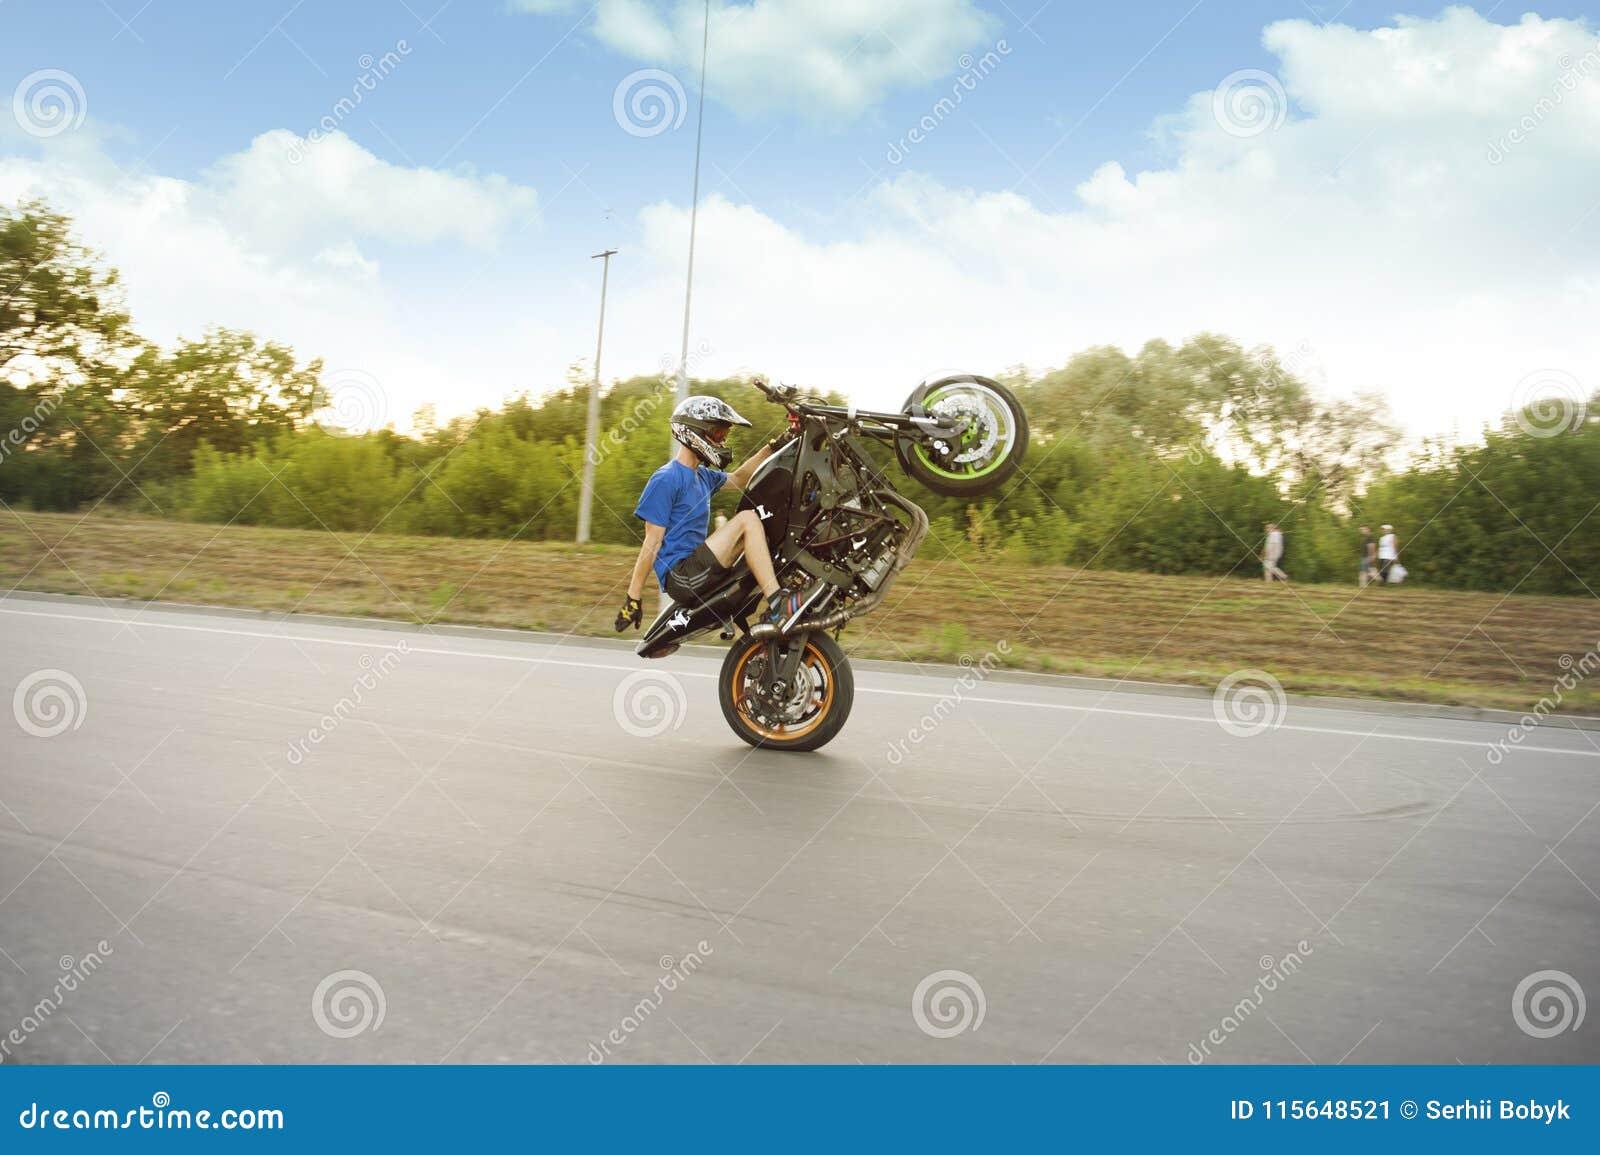 Stuntsman Riding Fast On One Wheel  Editorial Photo - Image of ride